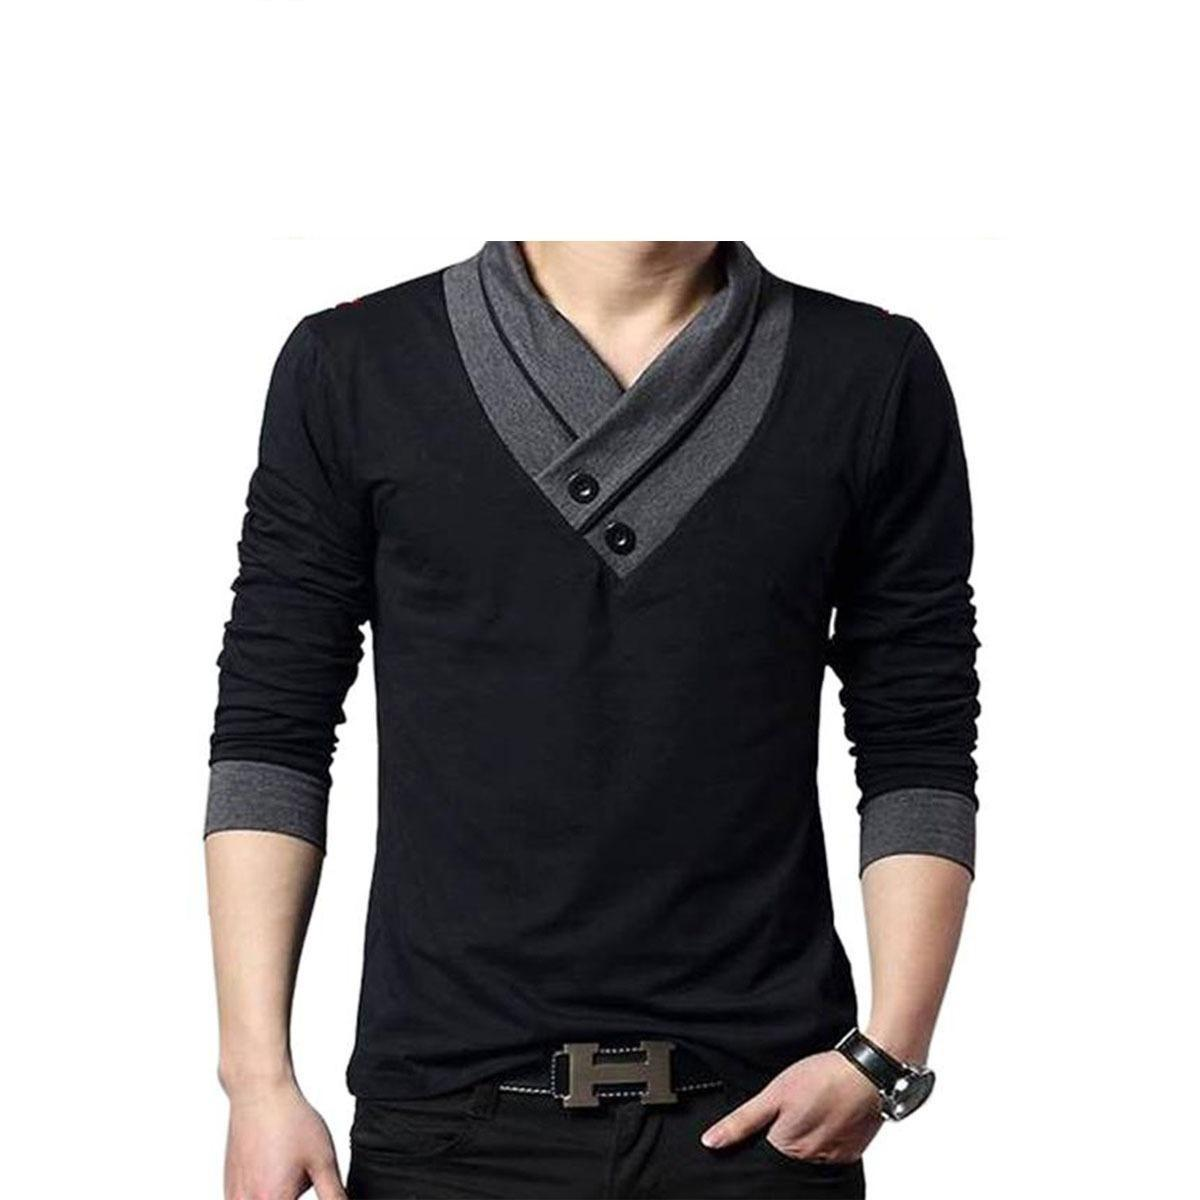 828296205b9 Men s T-Shirts Online  Buy T-Shirts For Men In Bangladesh – Daraz